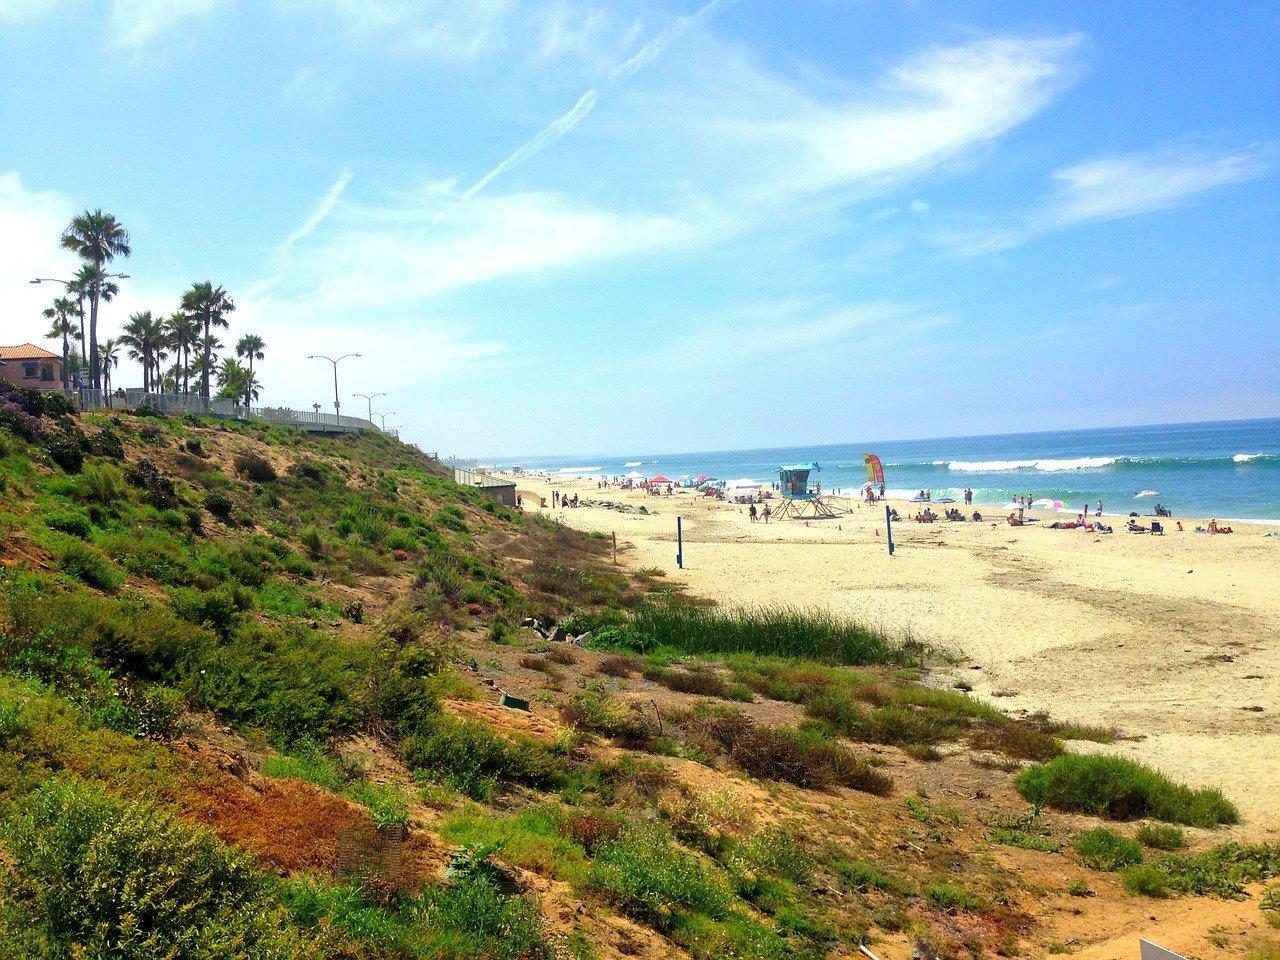 Carlsbad Beach San Diego - Free photo on Pixabay